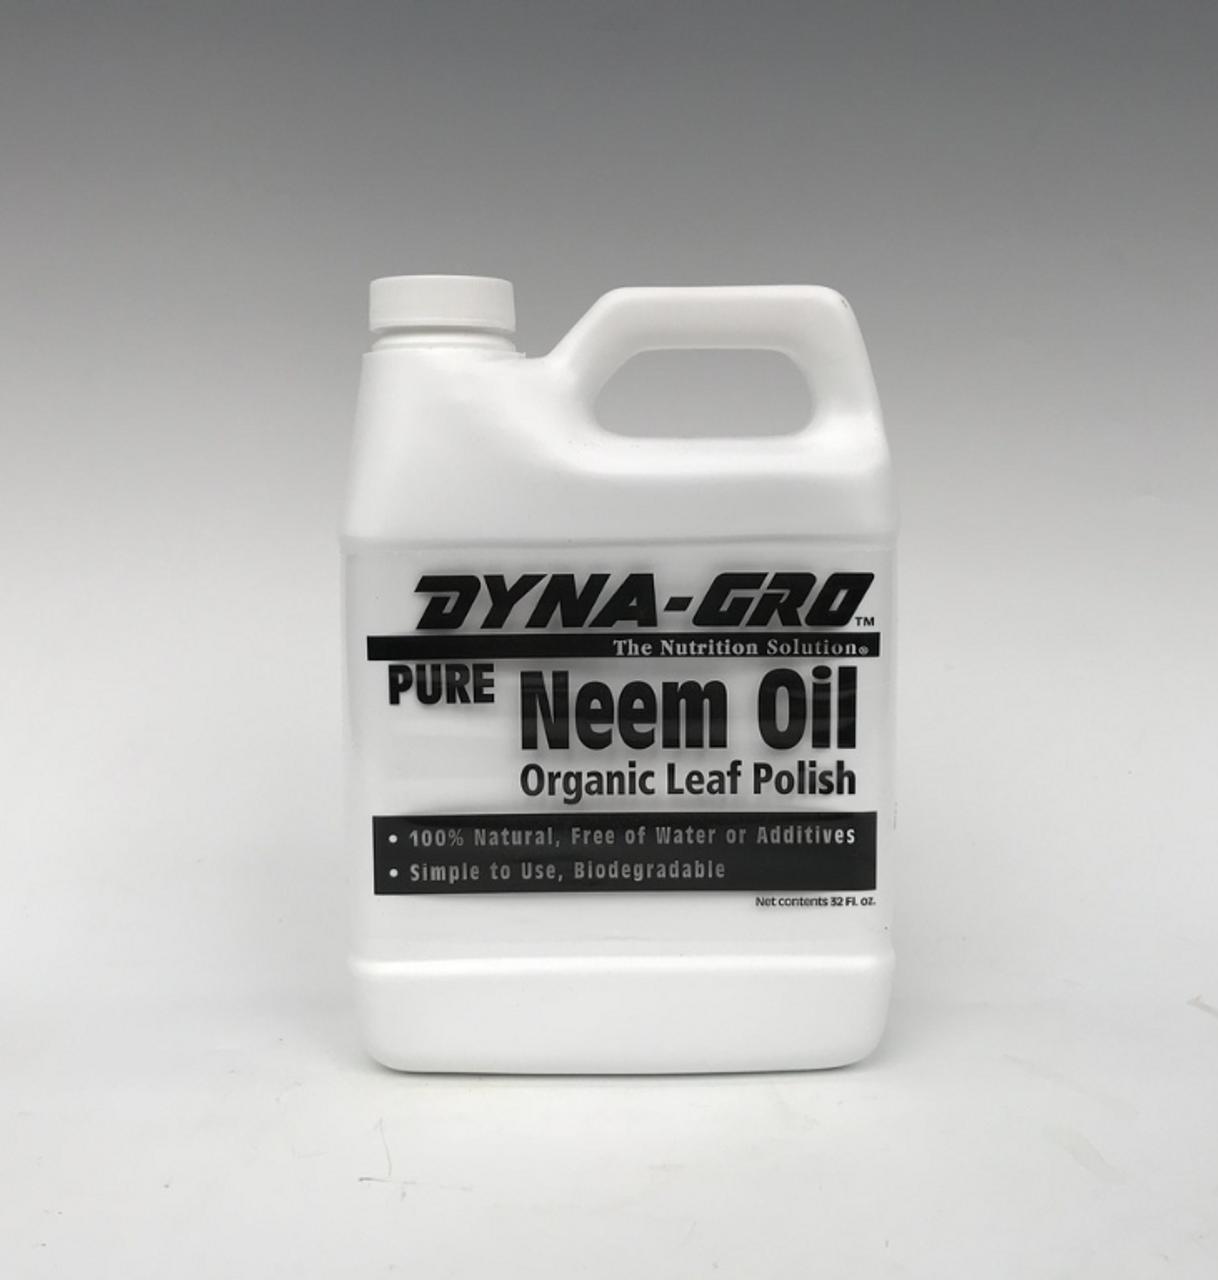 Dyna-Gro Neem Oil